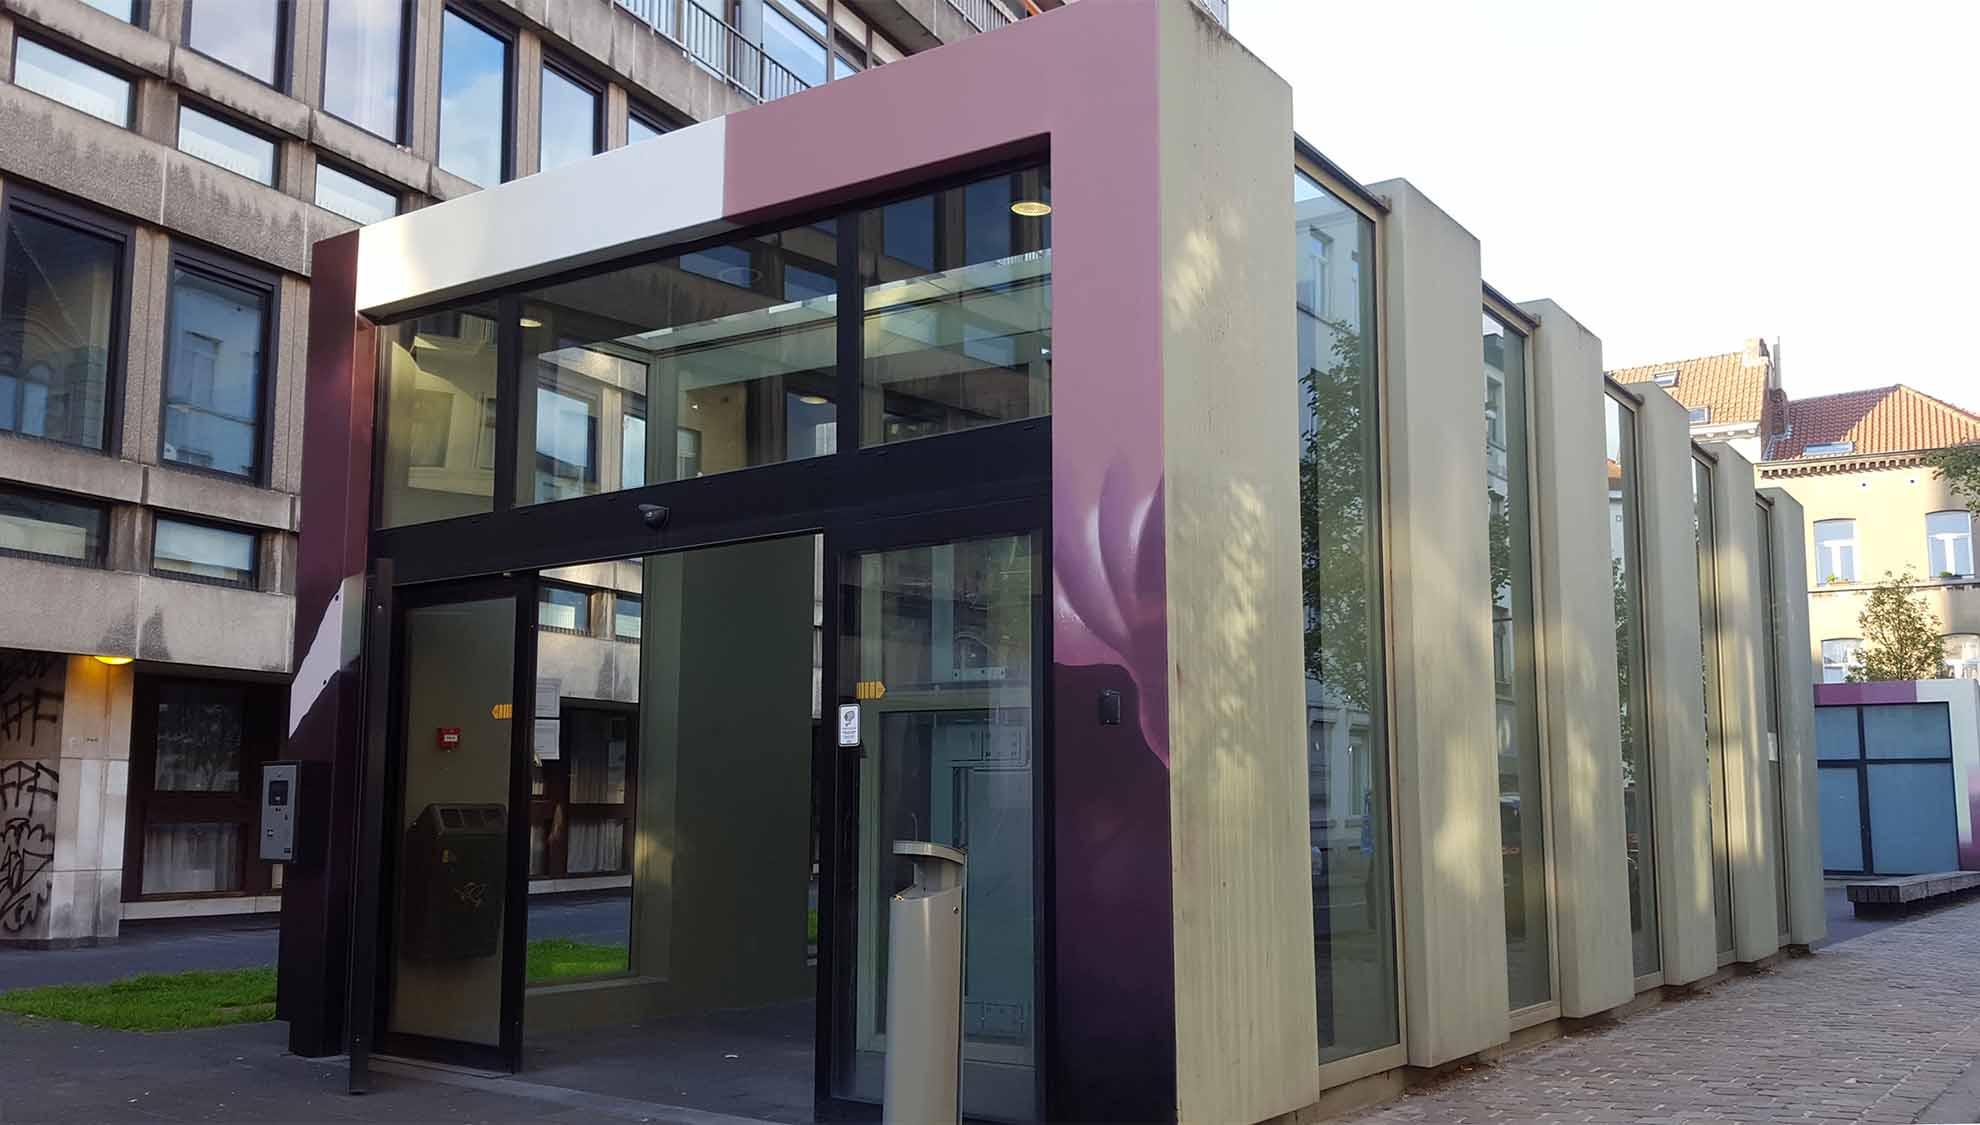 https://www.propaganza.be/wp-content/uploads/2019/05/Propaganza-ixelles-bruxelles-graffiti-workshop-street-art-tulipe-4.jpg